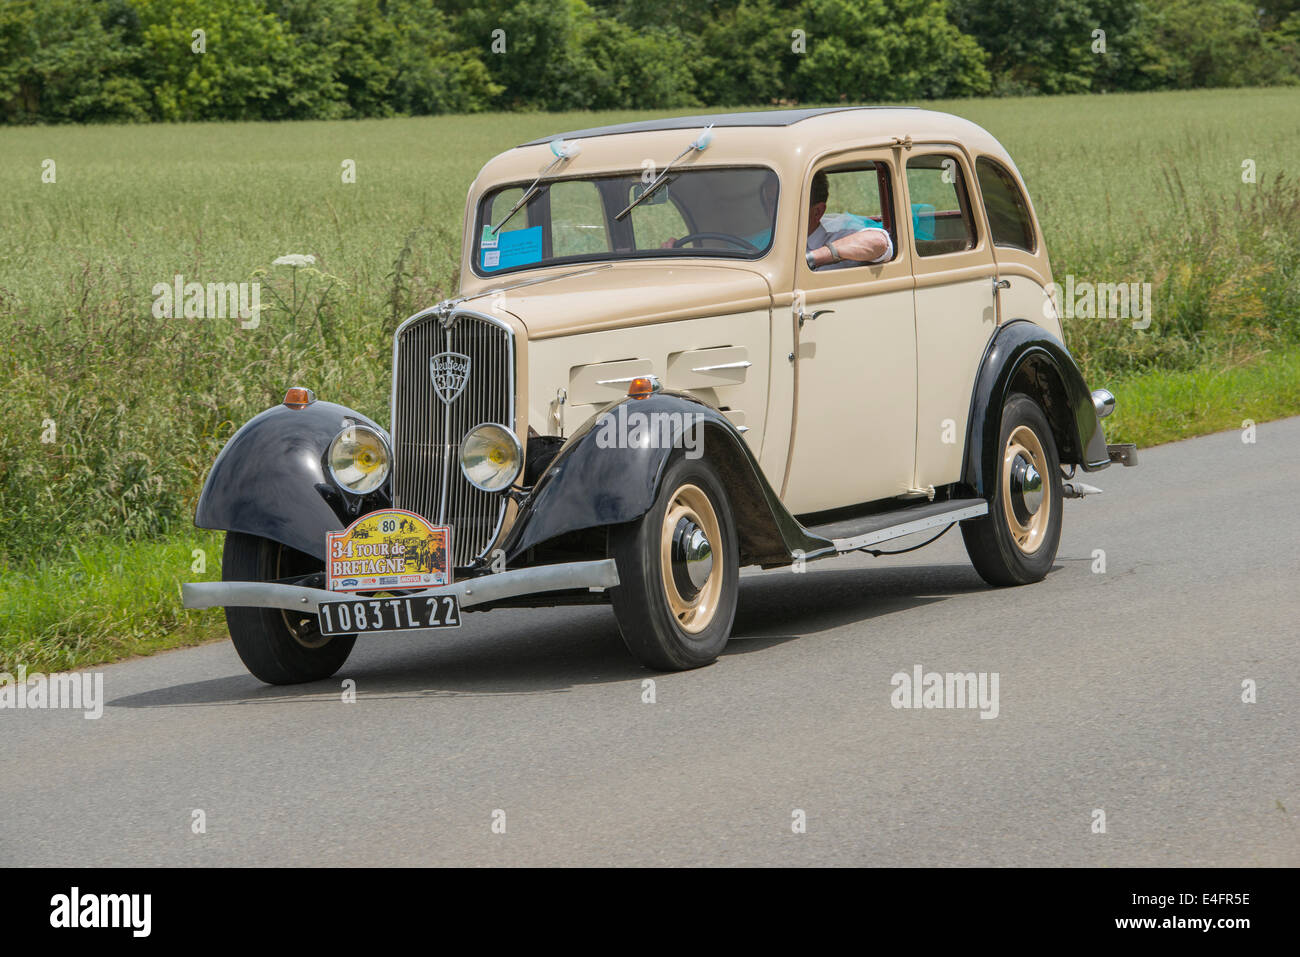 1934 cars photos 1934 cars images alamy. Black Bedroom Furniture Sets. Home Design Ideas